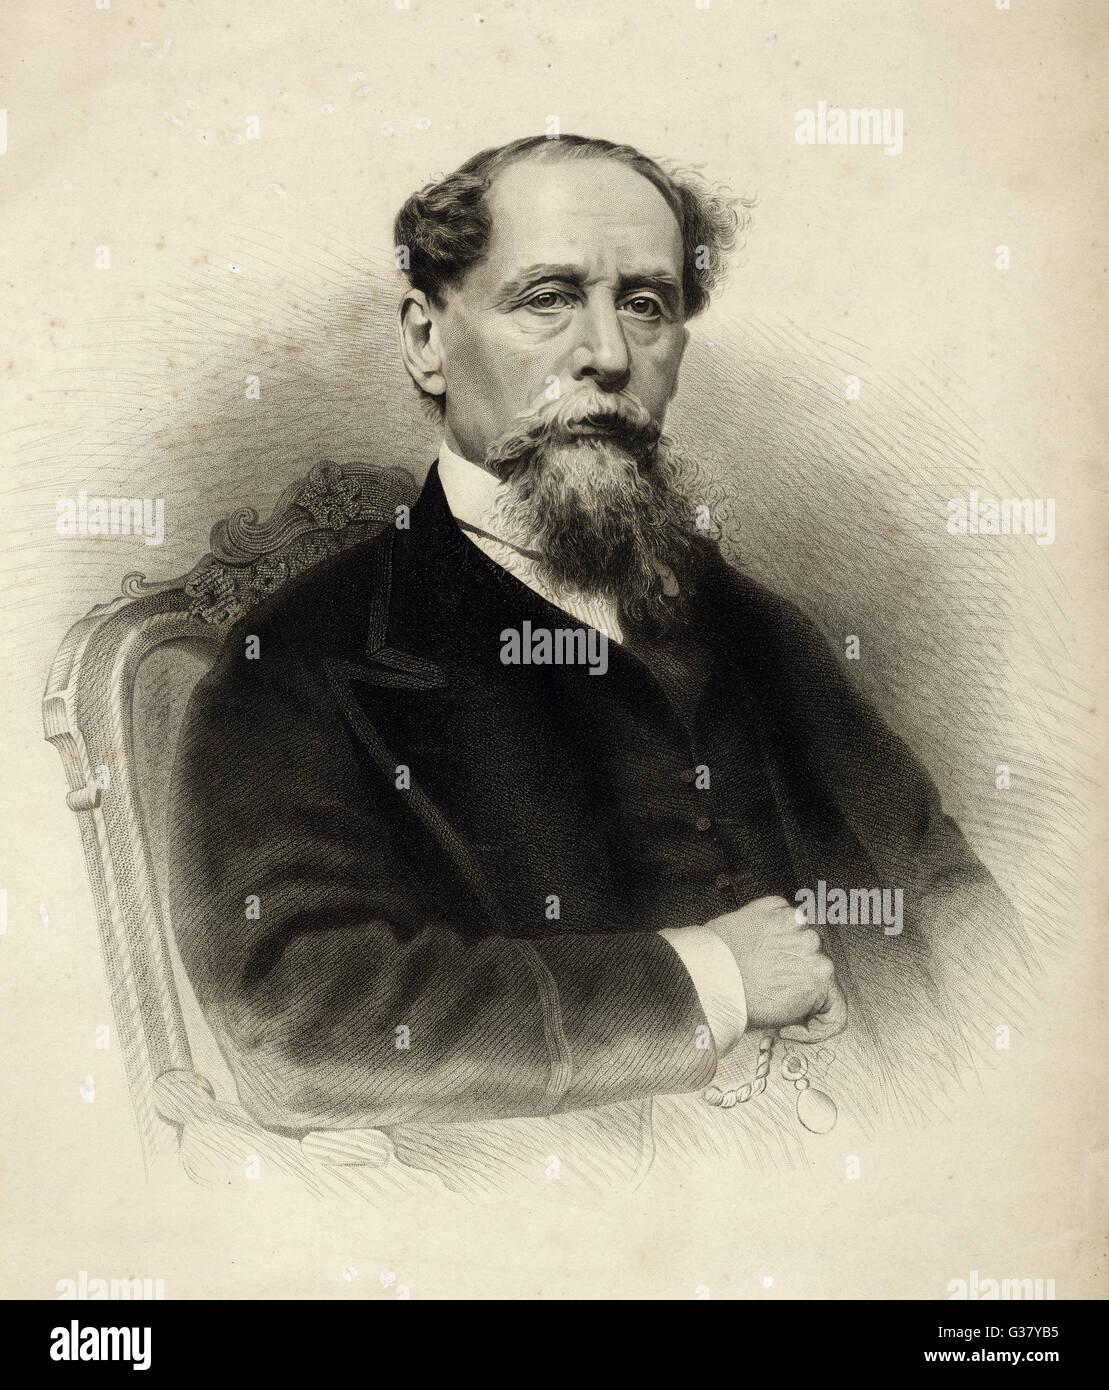 Charles Dickens(1812-1870), English writer. Stock Photo